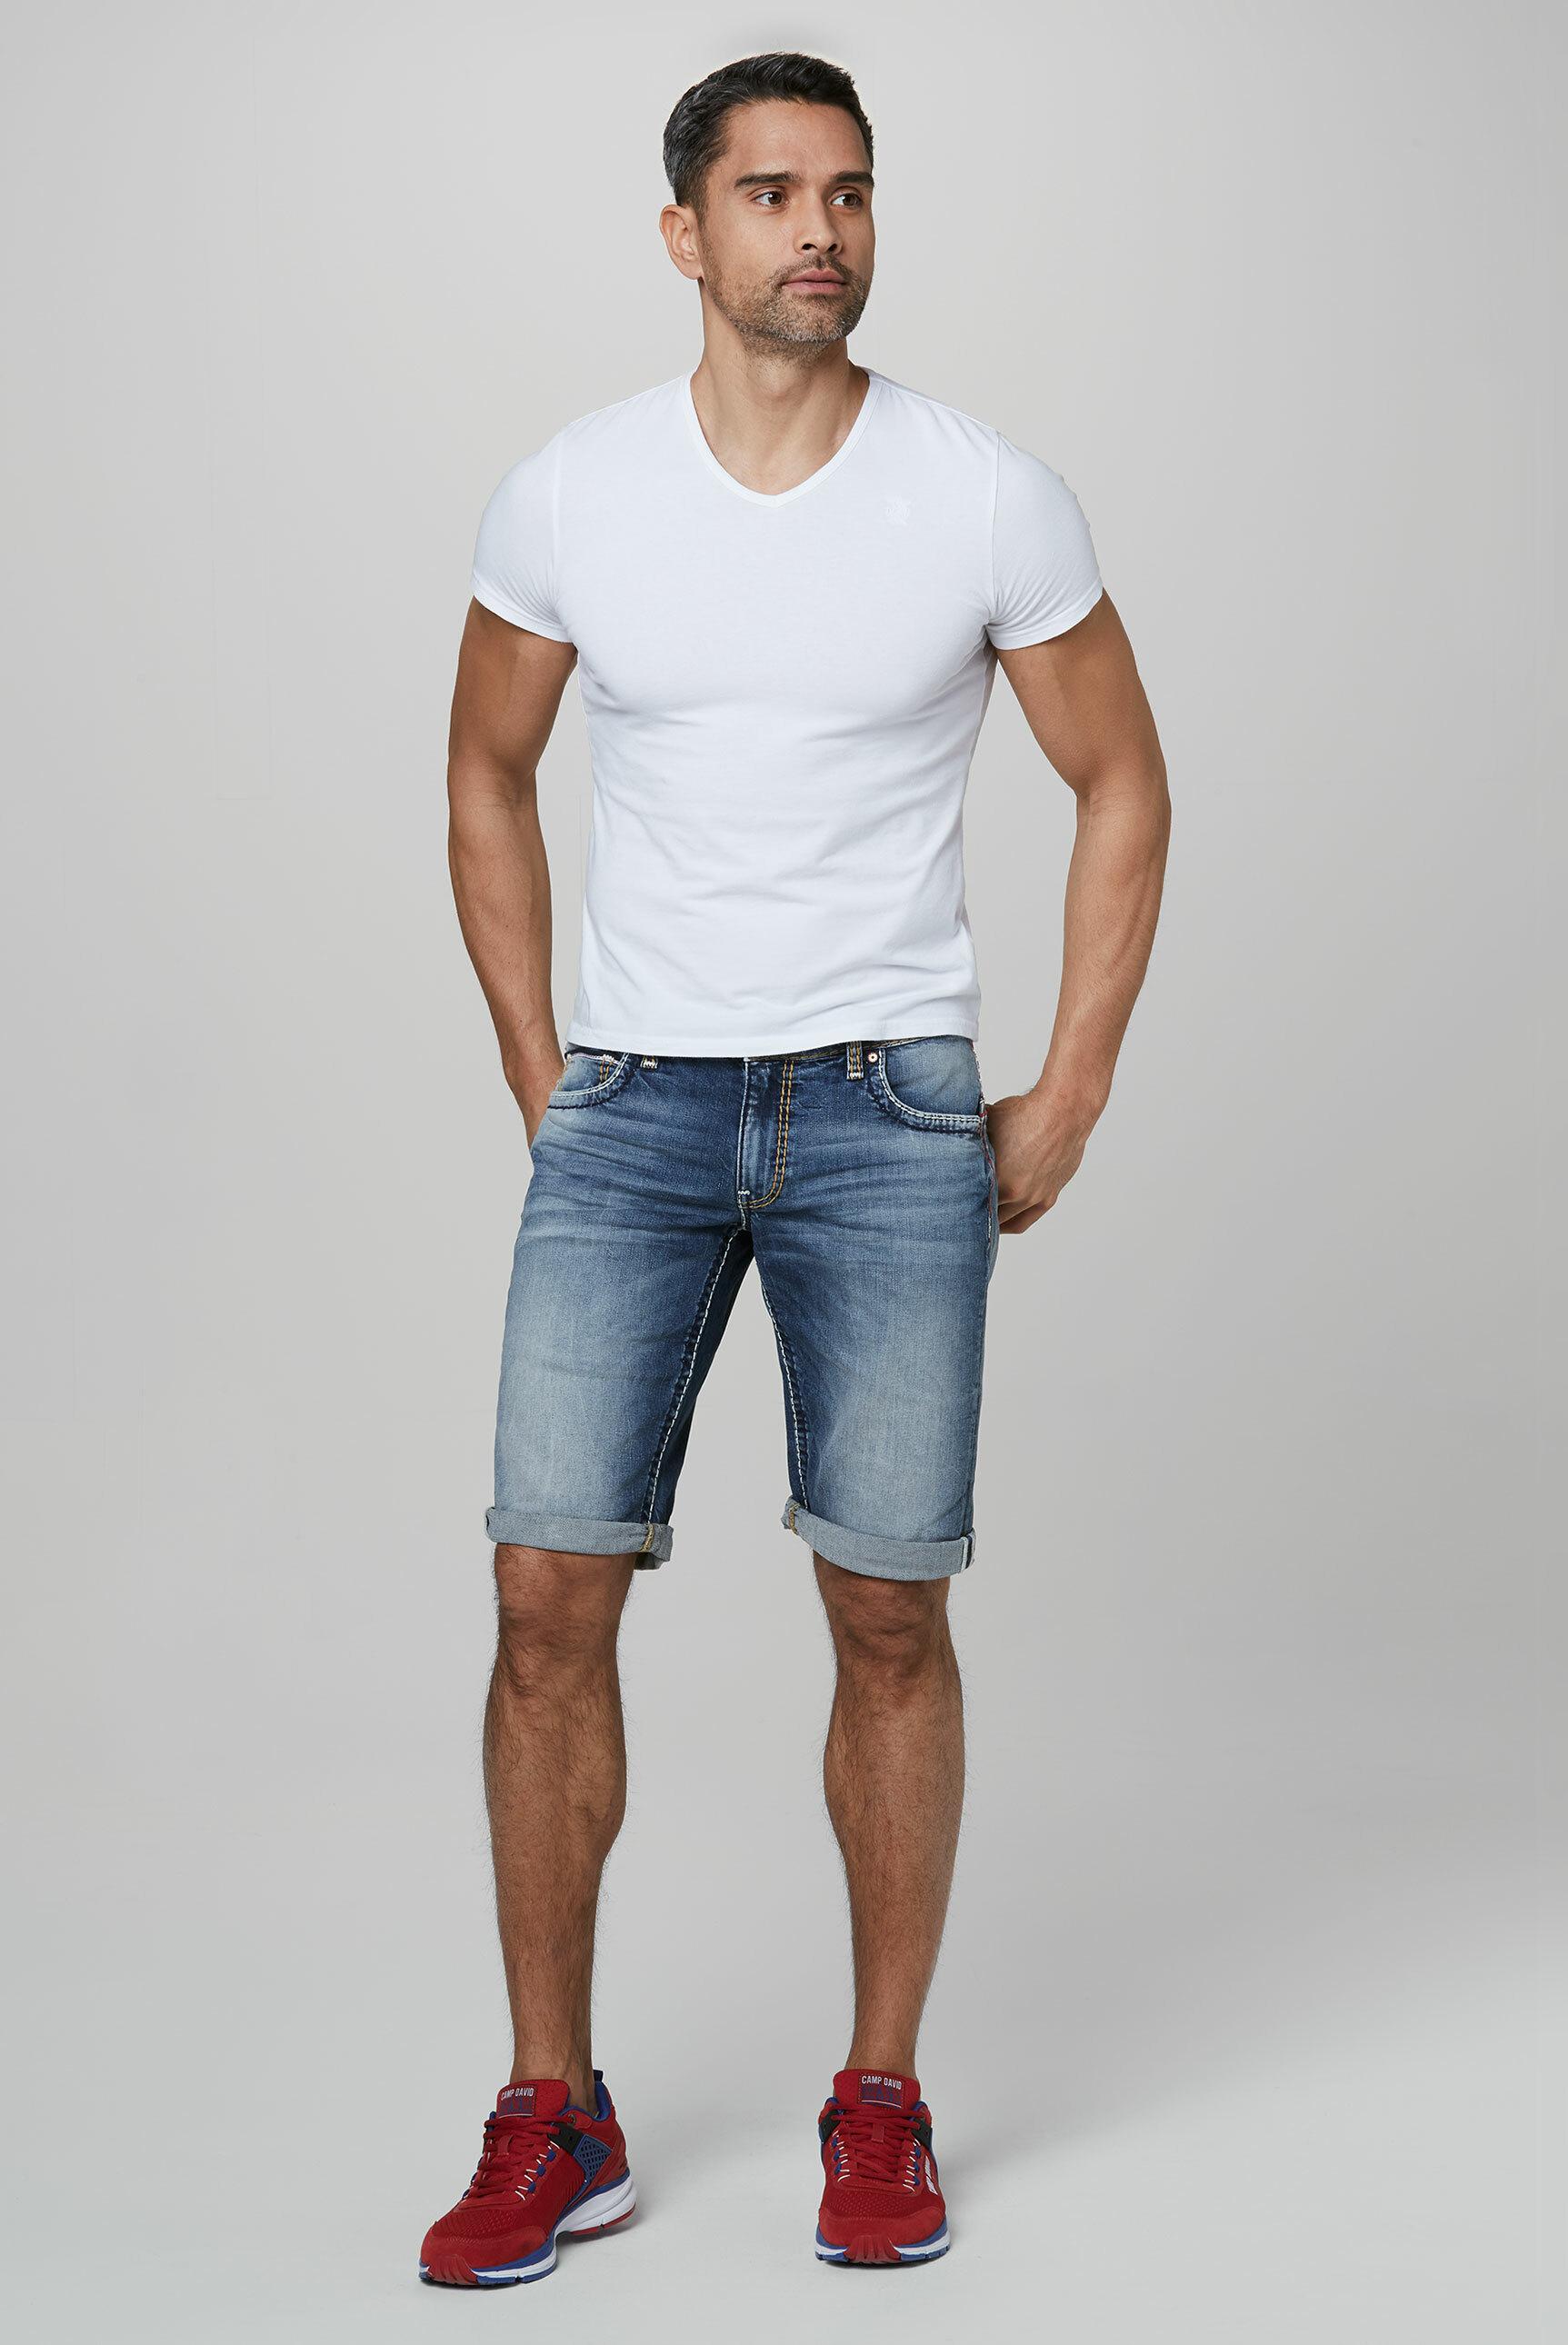 Skater Jeans CO:NO mit bunten Nähten